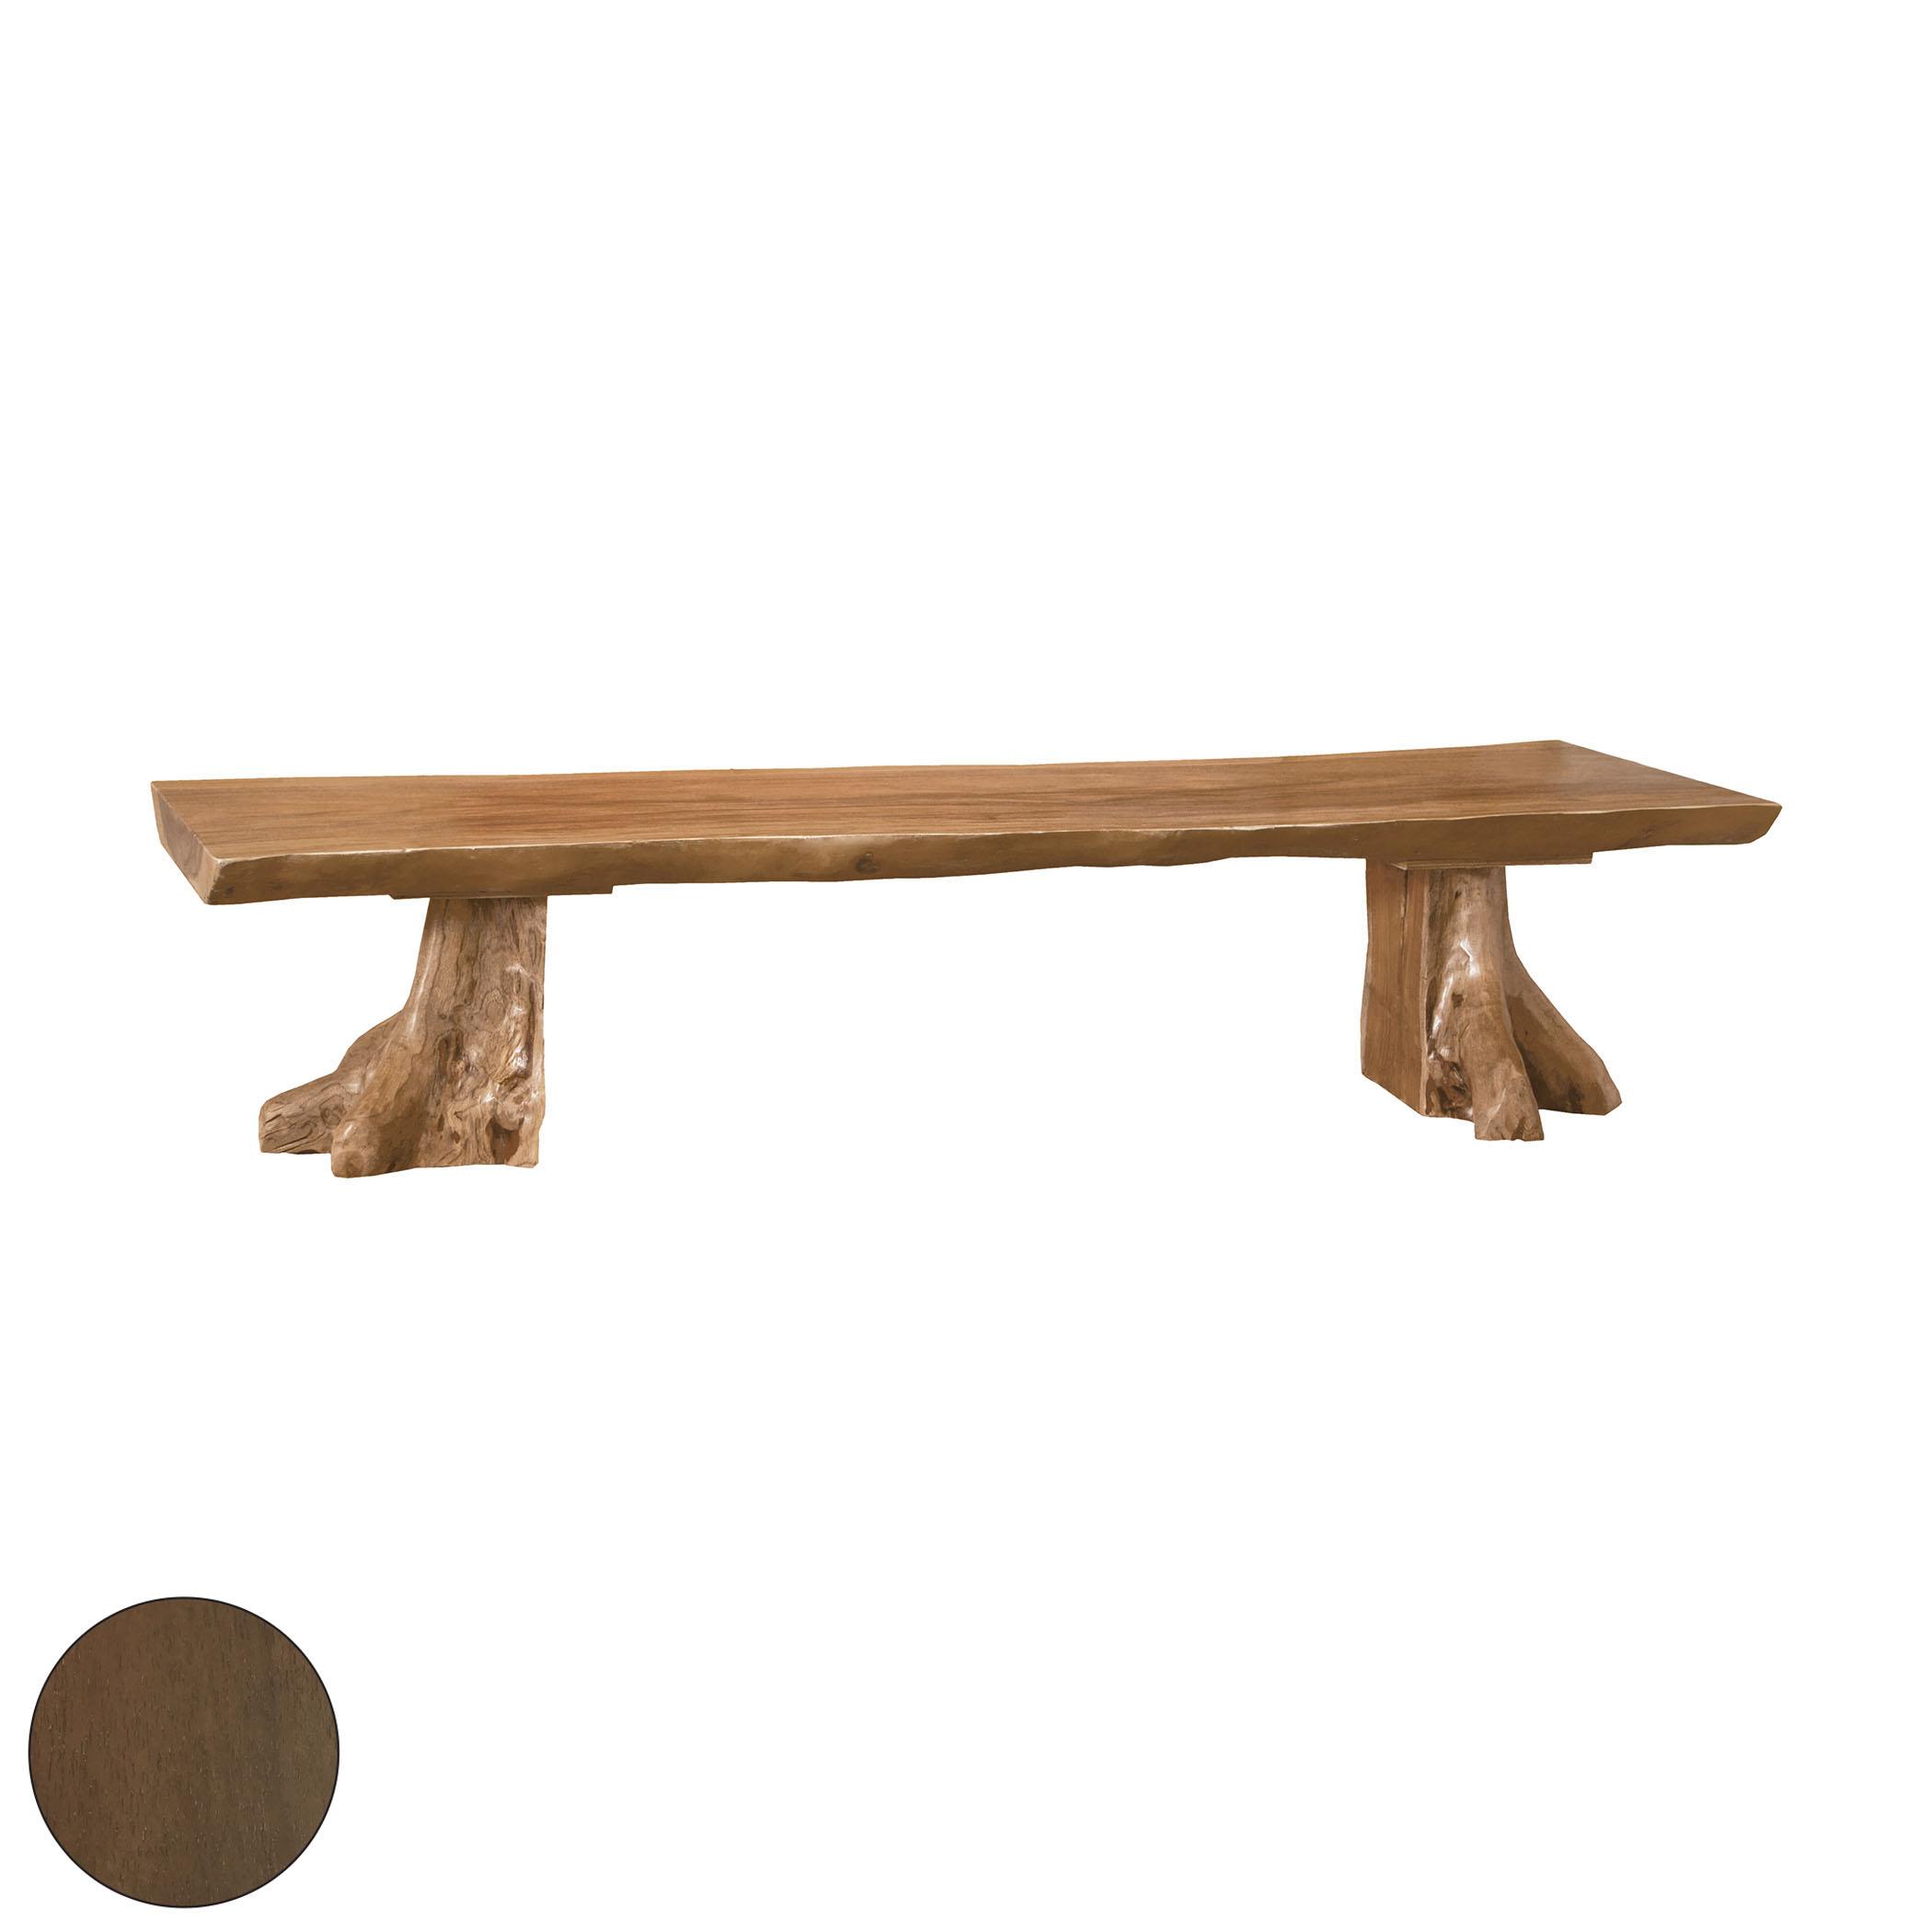 Teak Slab Bench 6517518BU | ELK Home